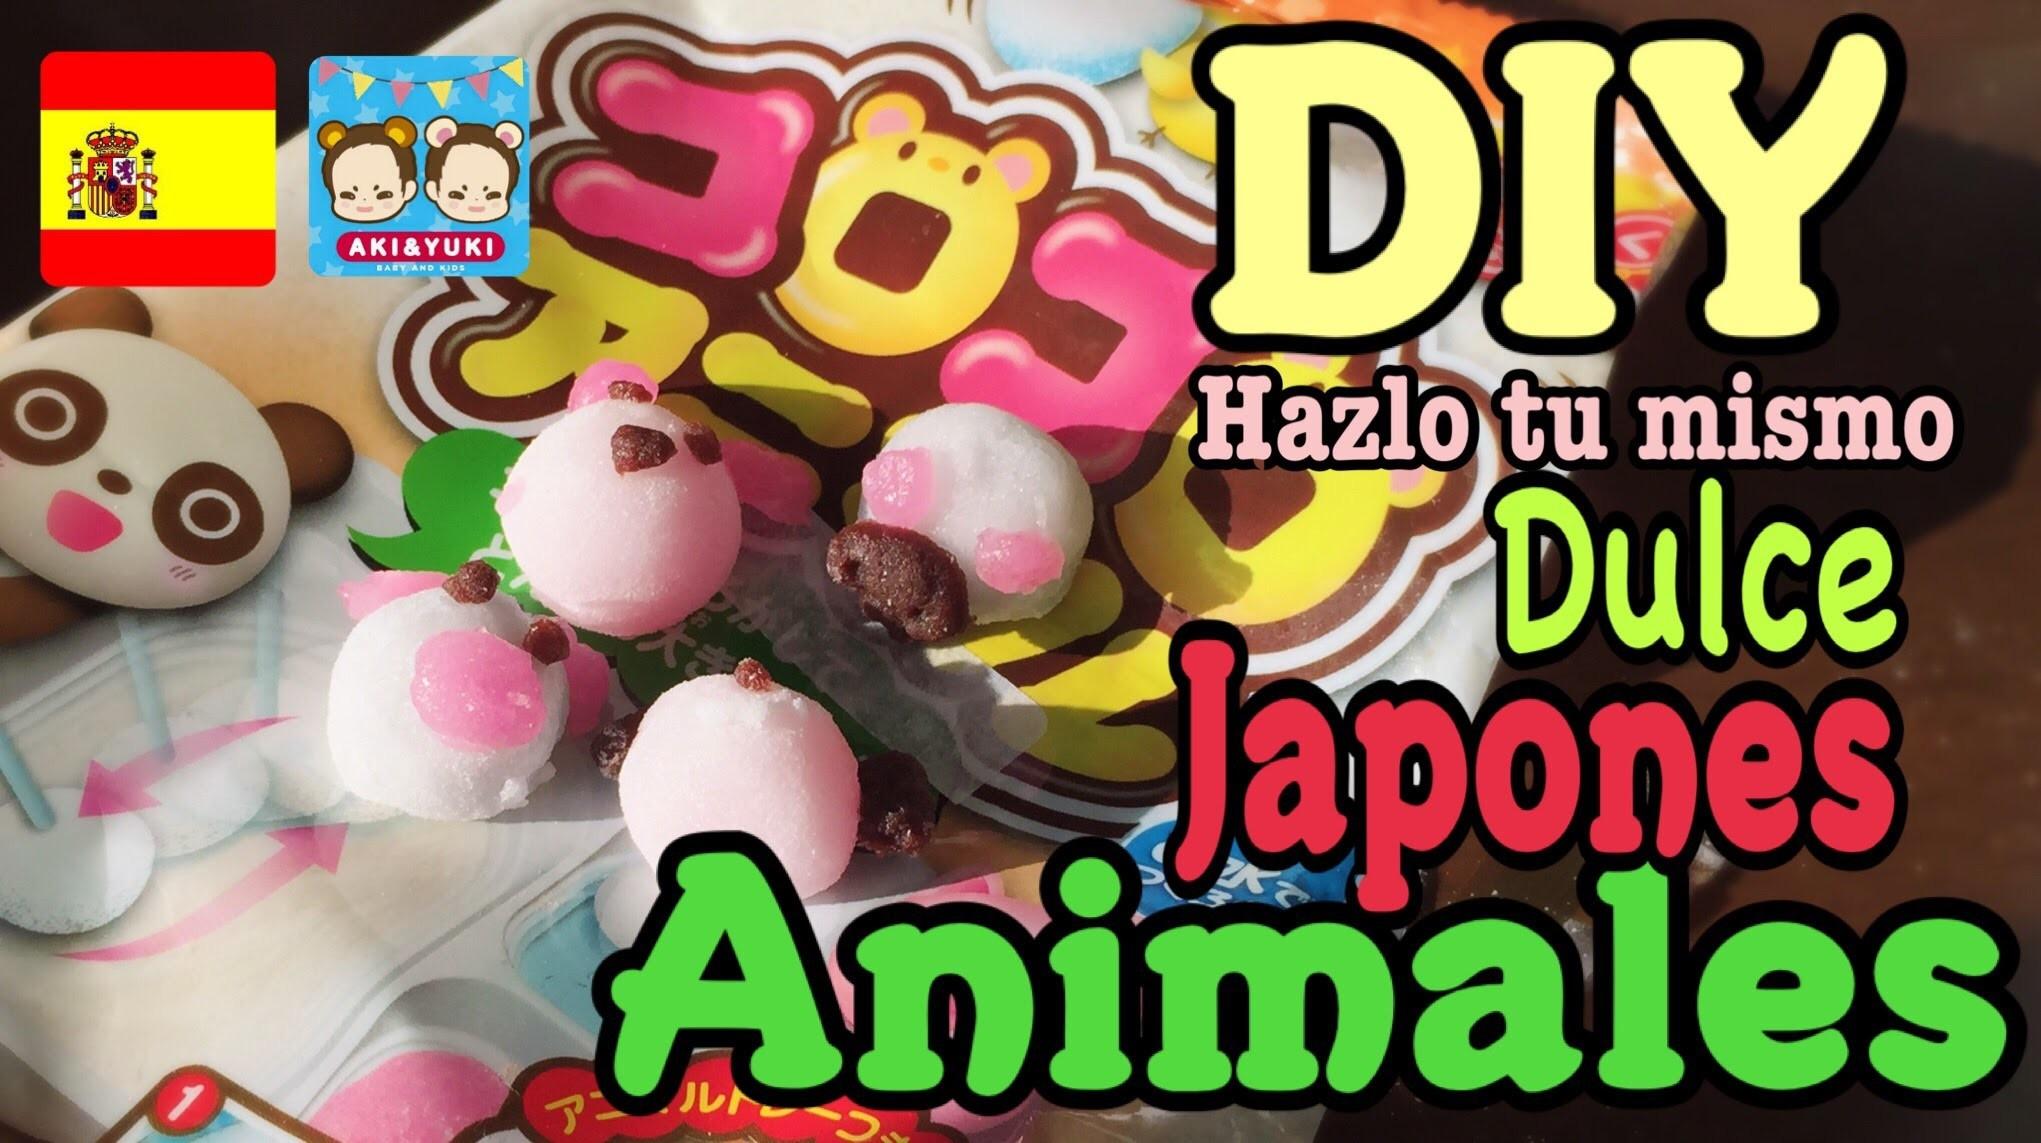 DIY Comida miniatura crea Animales de dulce japones Español manualidades niñas